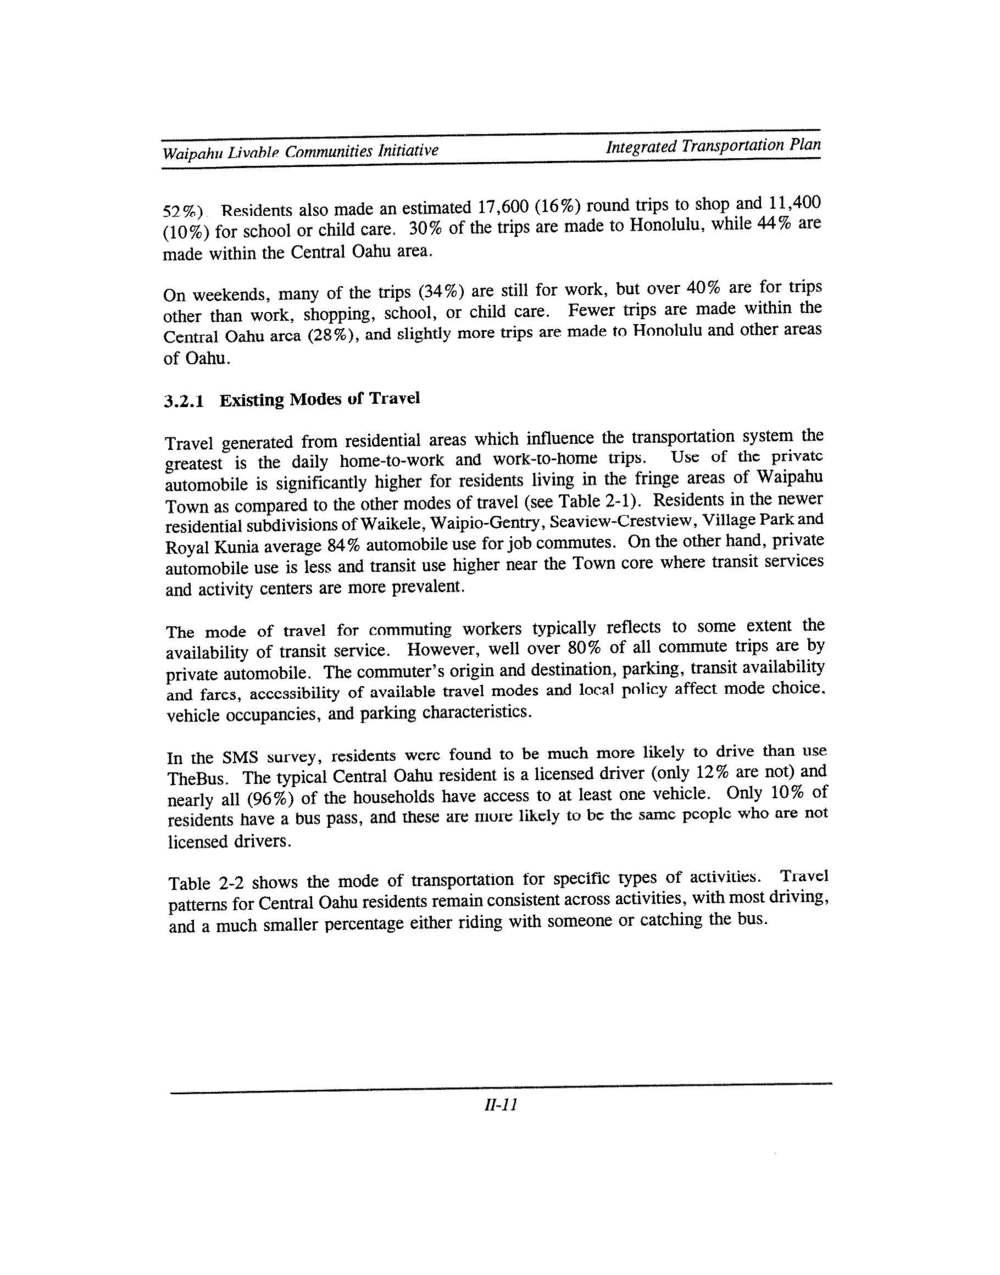 160531_WaipahuLivableCommunities(1998)_Page_026.jpg